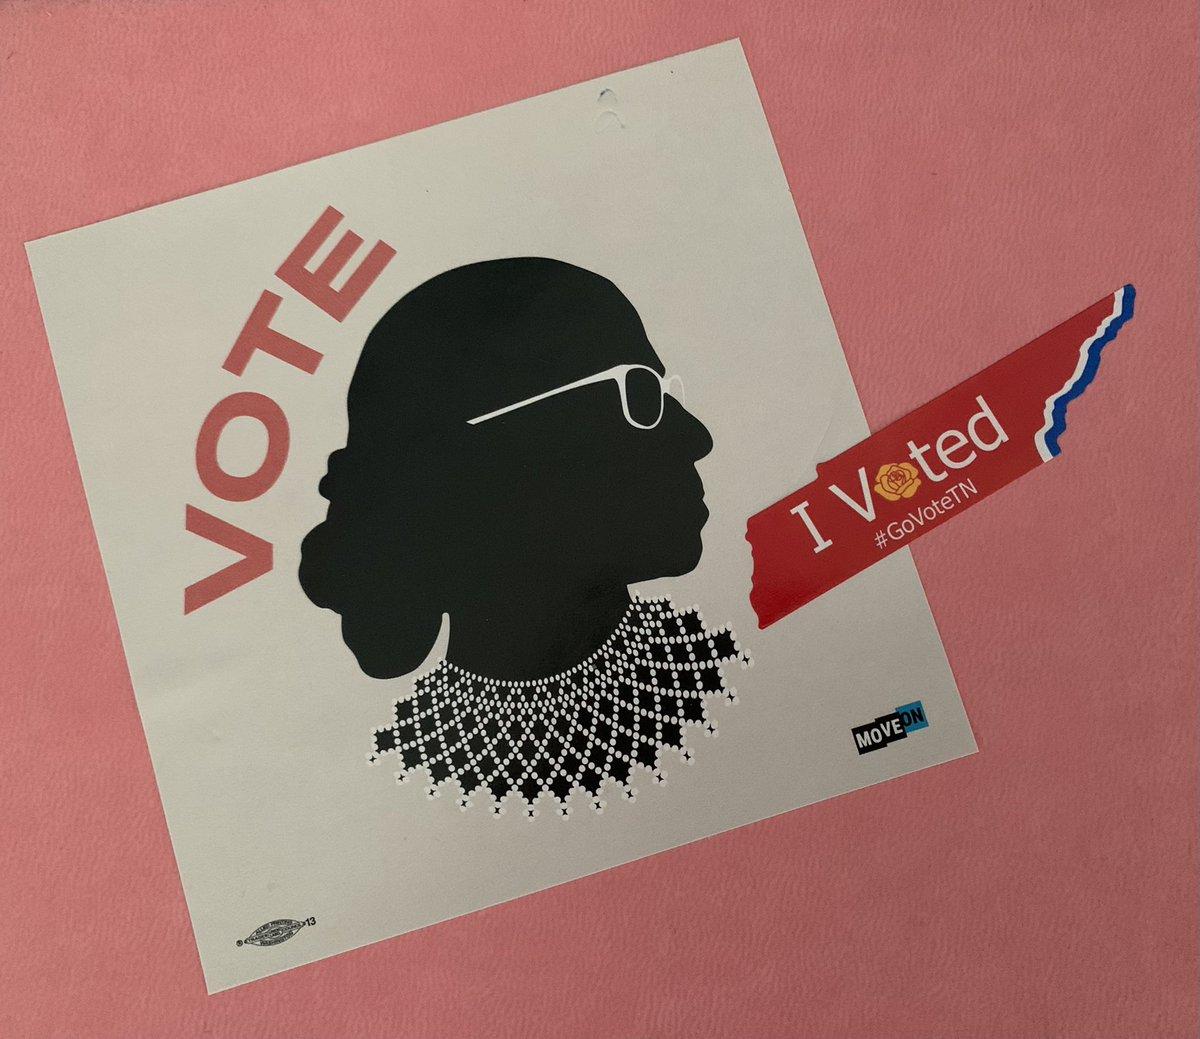 #Vote2020 I believe in the process. #GoVoteTN